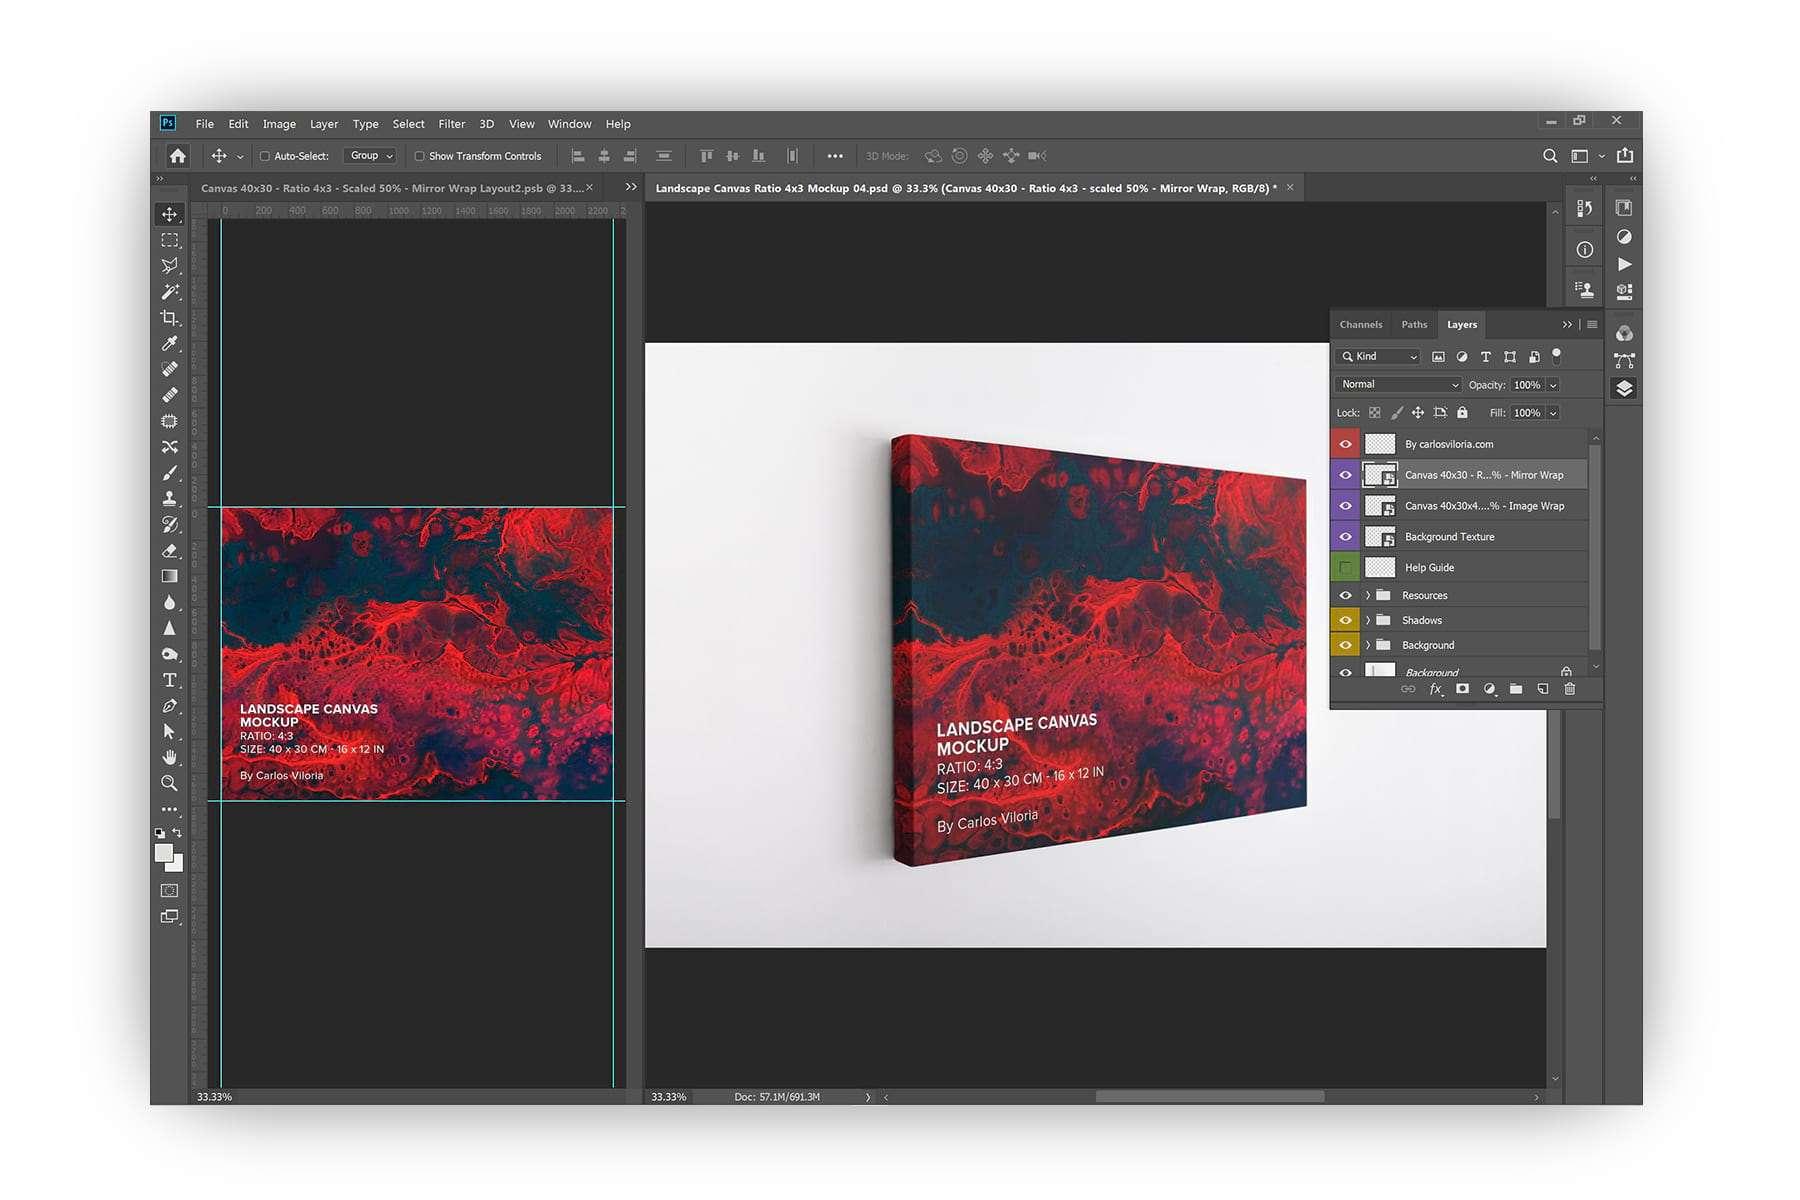 Hanging Landscape Canvas Ratio 4x3 Mockup for Photoshop